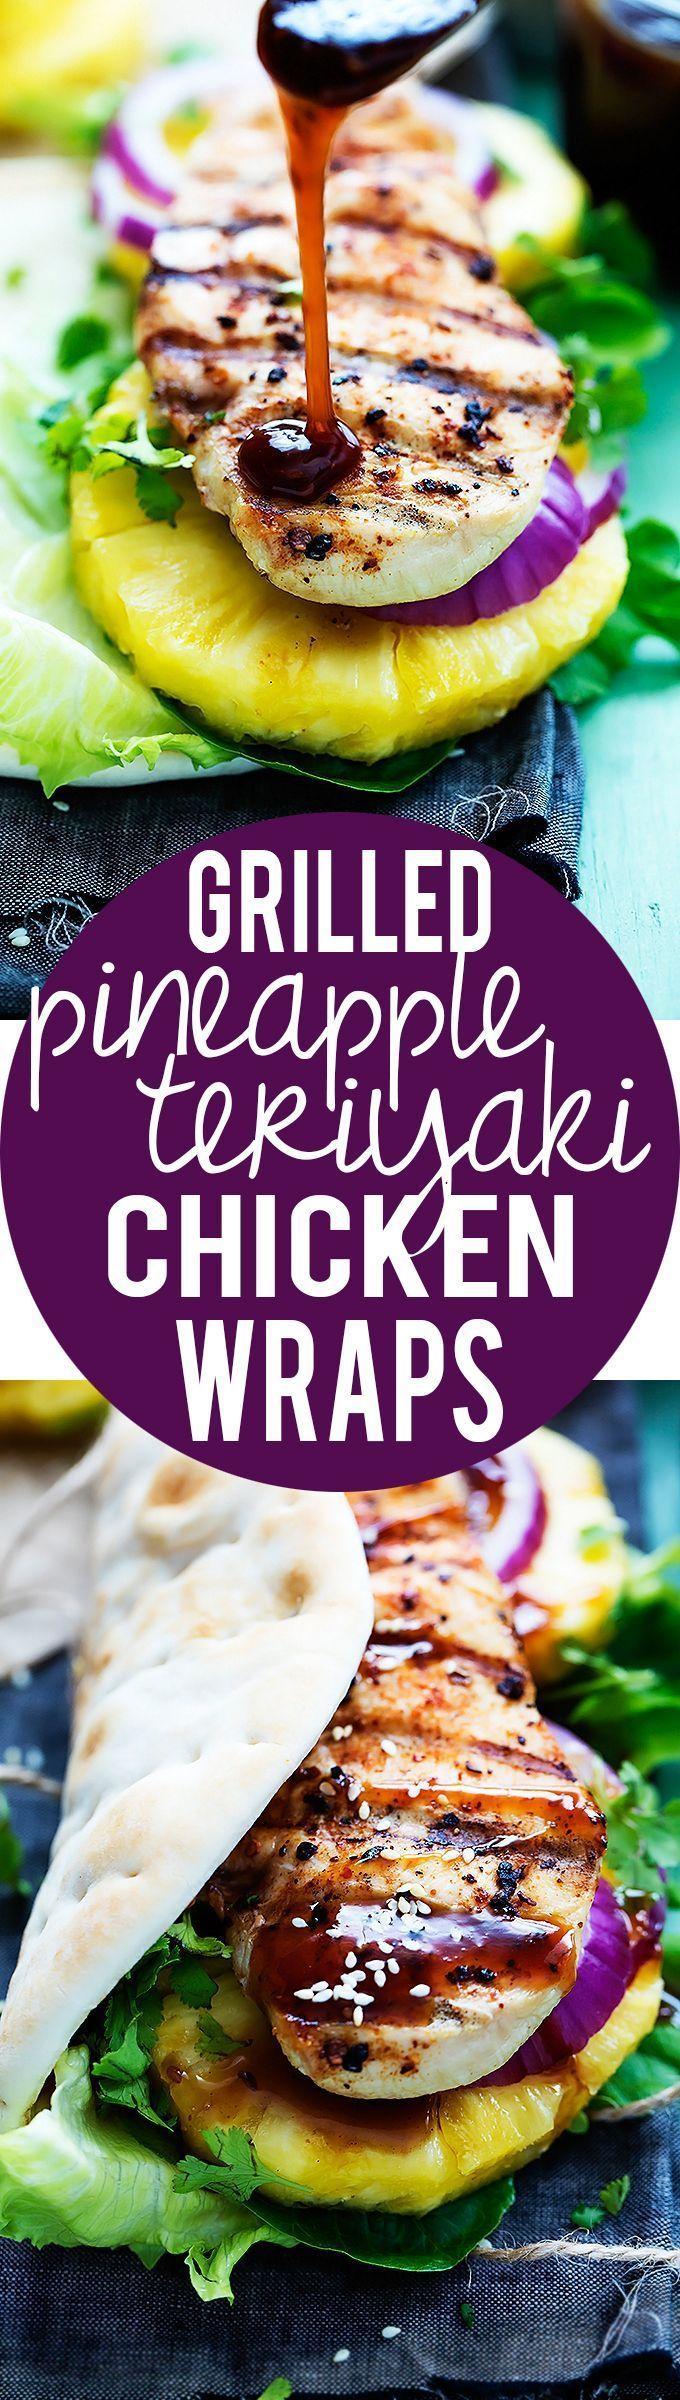 #Grilled Pineapple Chicken Teriyaki Wraps #Skinny4LifeEats™